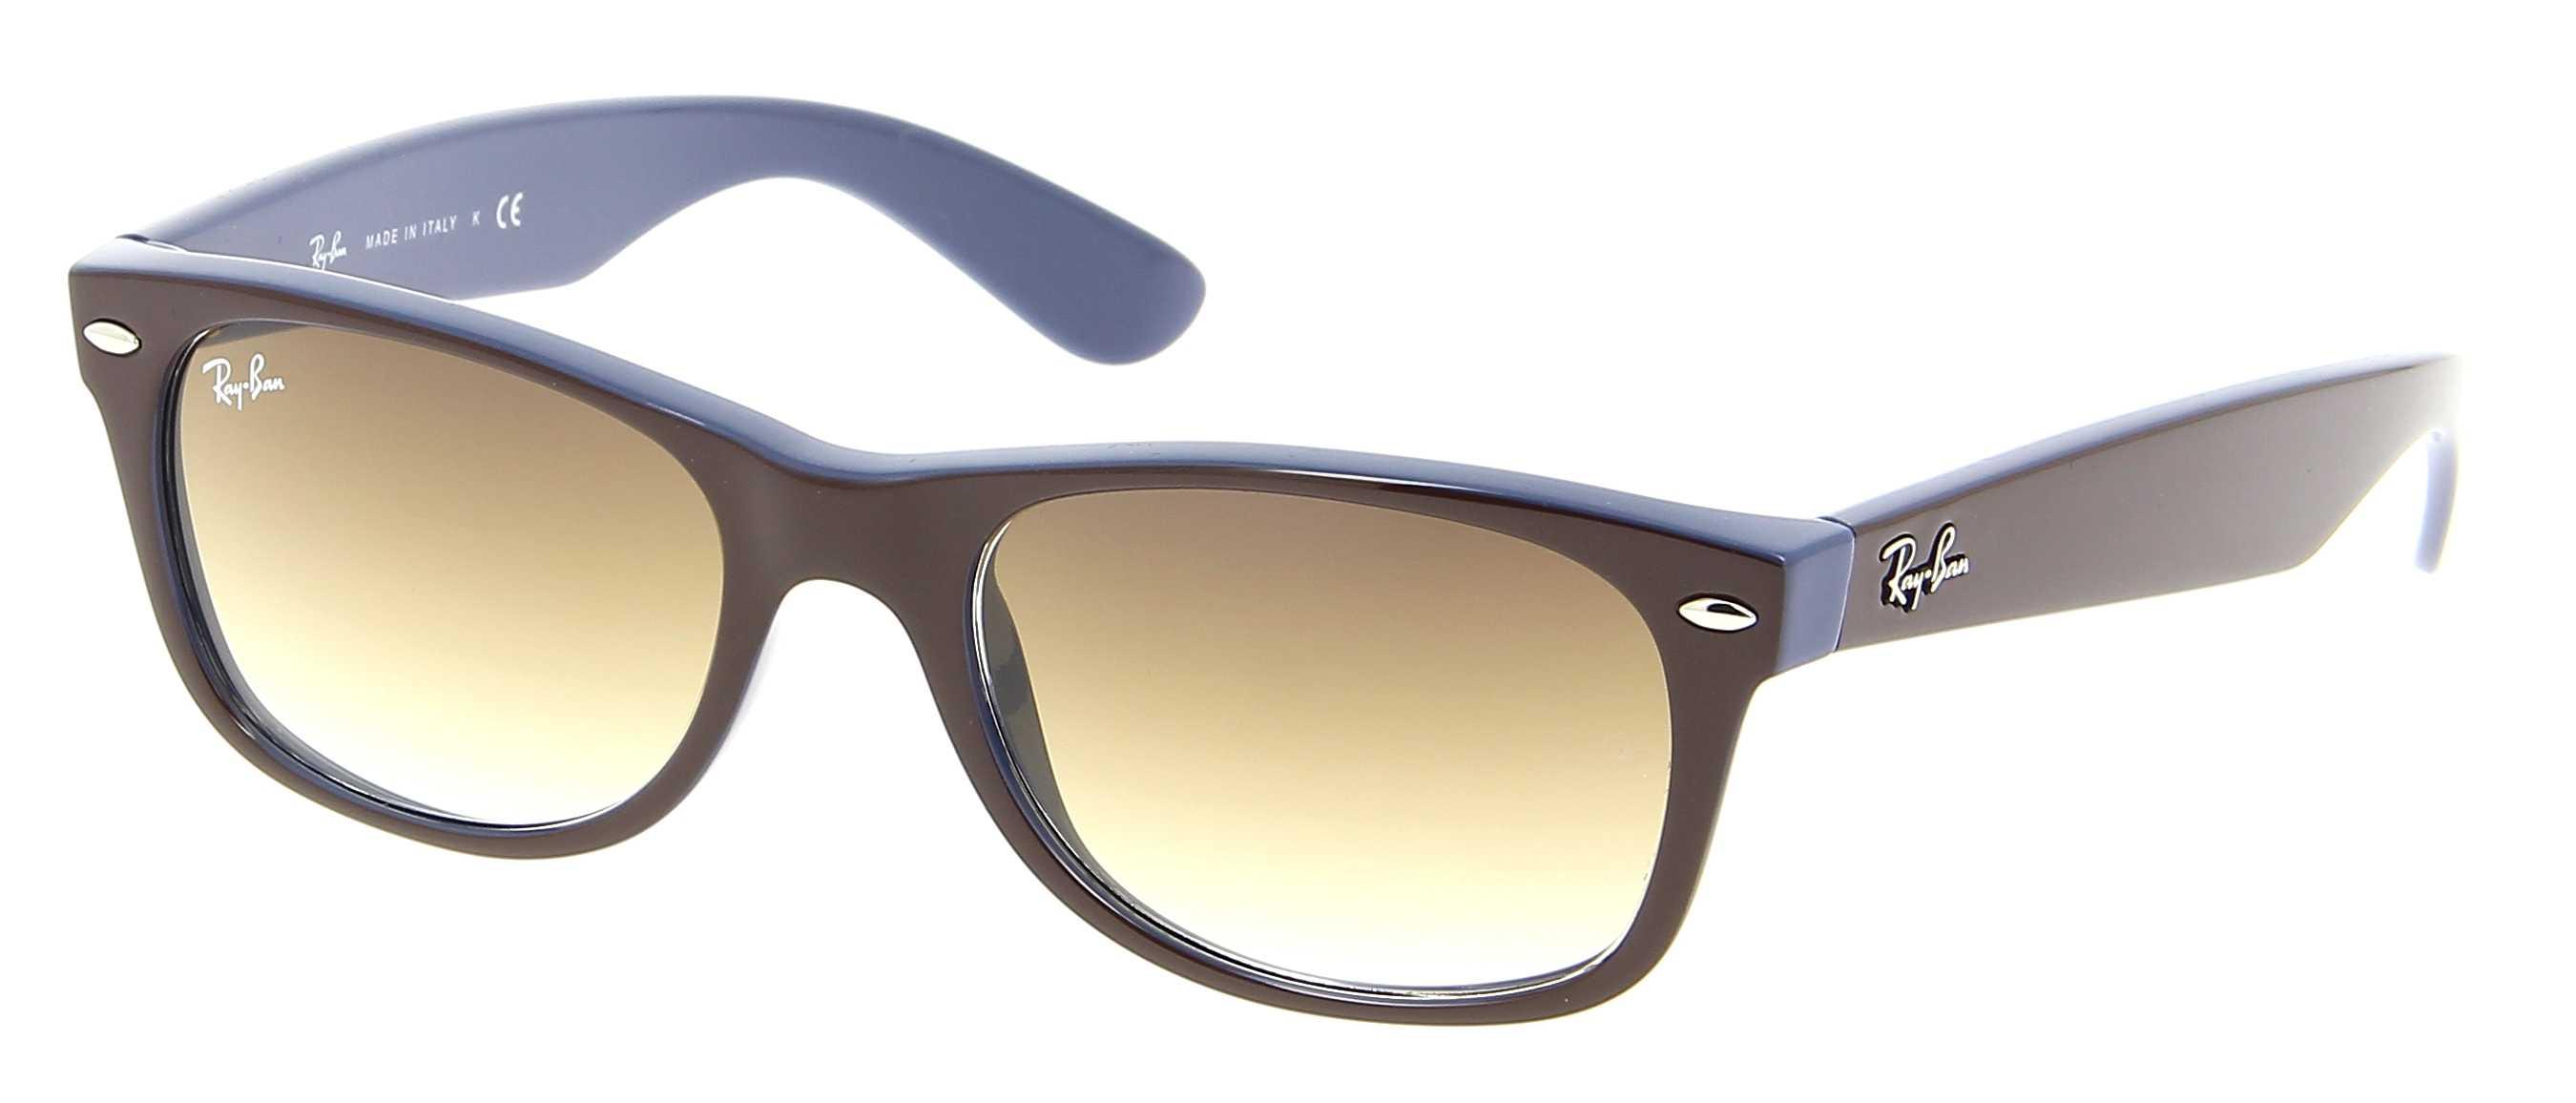 قبو المسئولية كافتيريا ray ban ray ban jackie ohh jackie au sunglasses amp 3 colors unisex